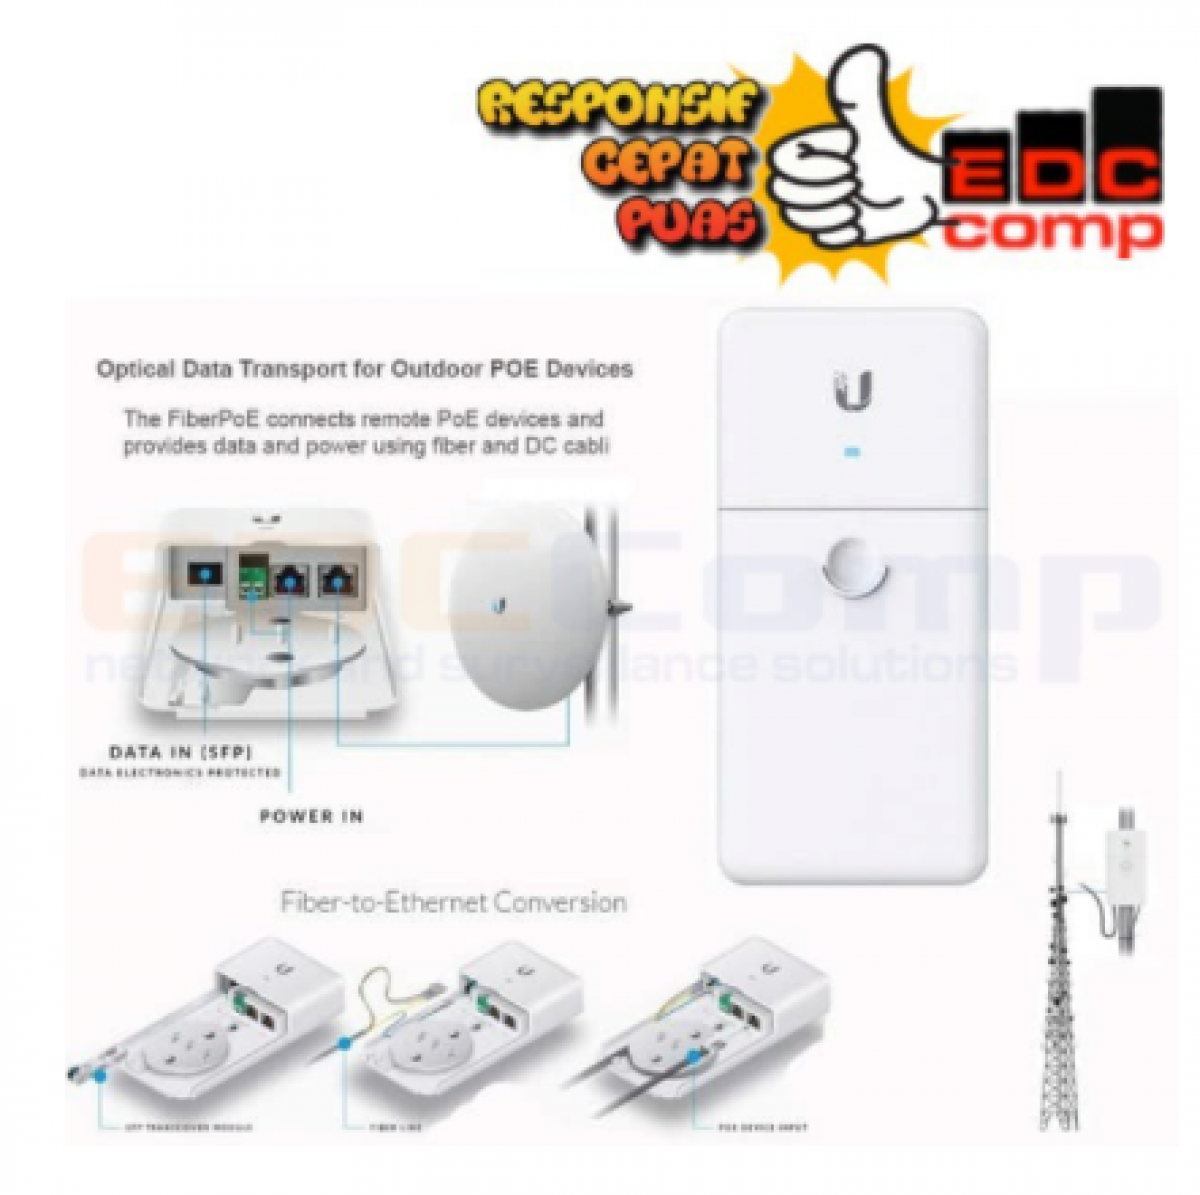 UBIQUITI F-POE-G2 Fiber POE Optical Data Transport Outdoor PoE - EdcComp